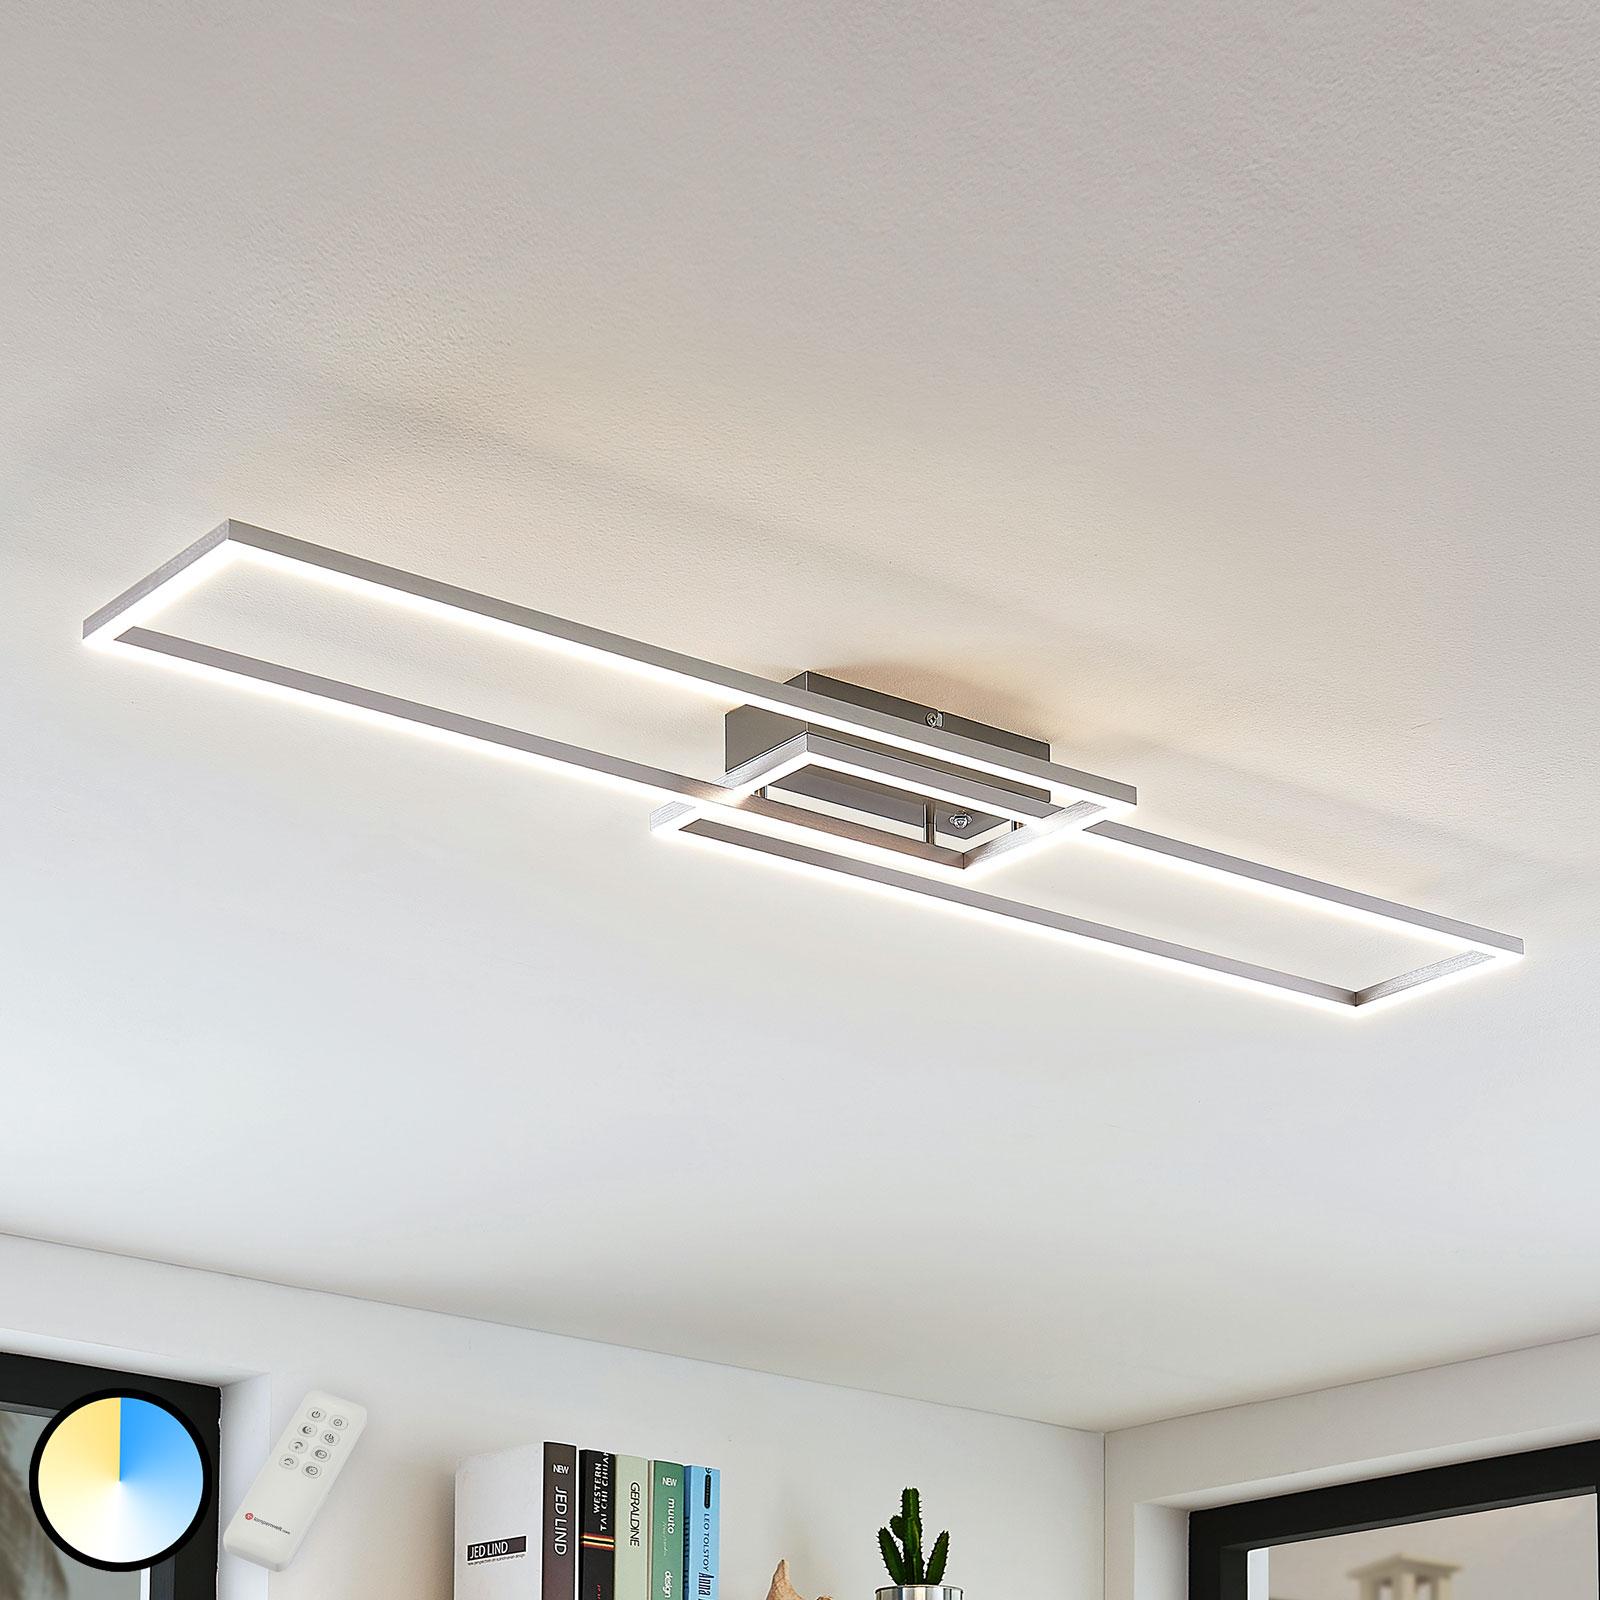 Stropné LED svietidlo Quadra stmievateľné 2pl 110_7620075_1